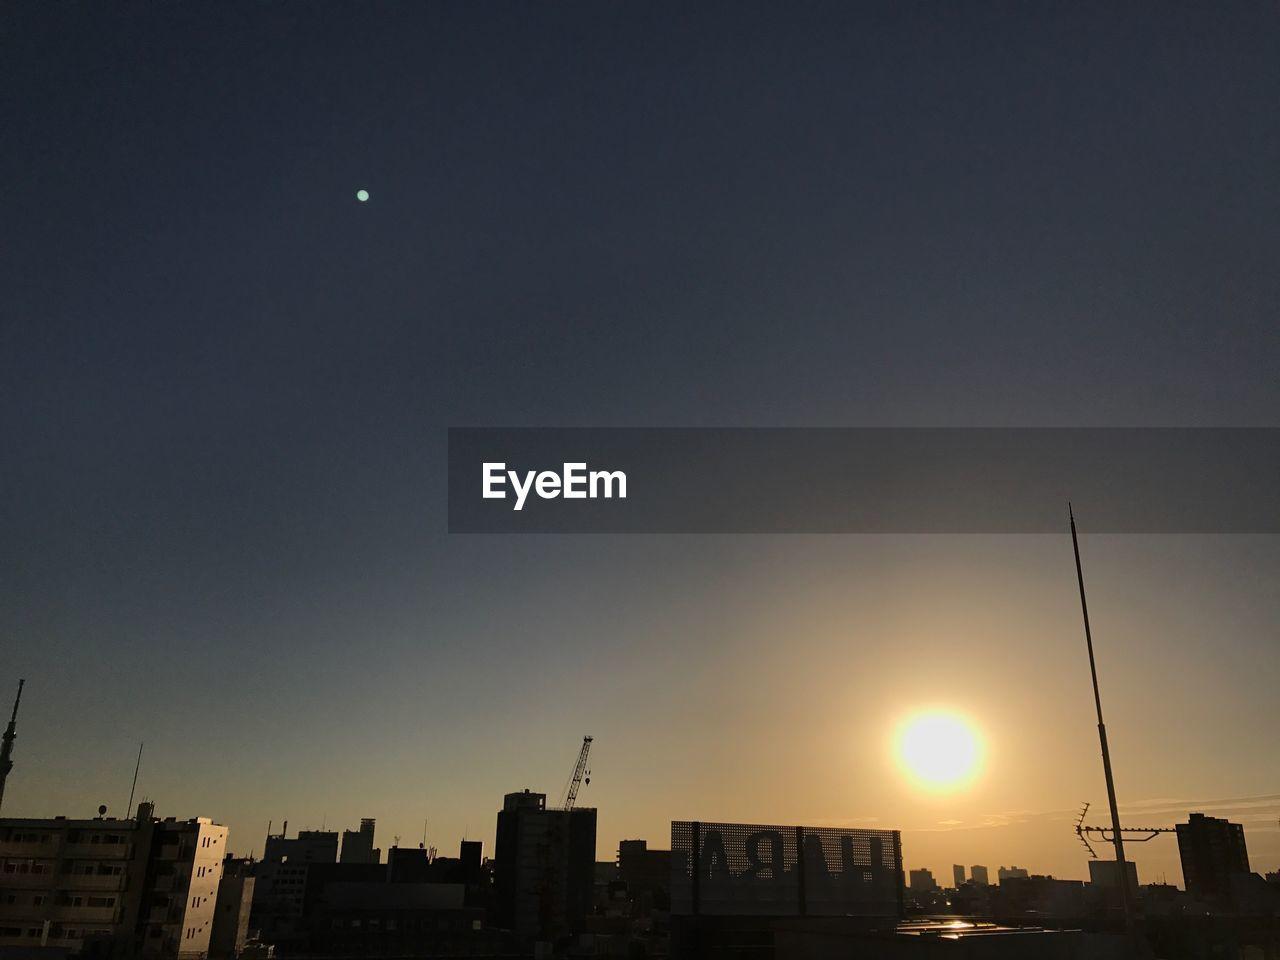 sunset, architecture, building exterior, city, built structure, sun, silhouette, sky, cityscape, moon, no people, skyscraper, outdoors